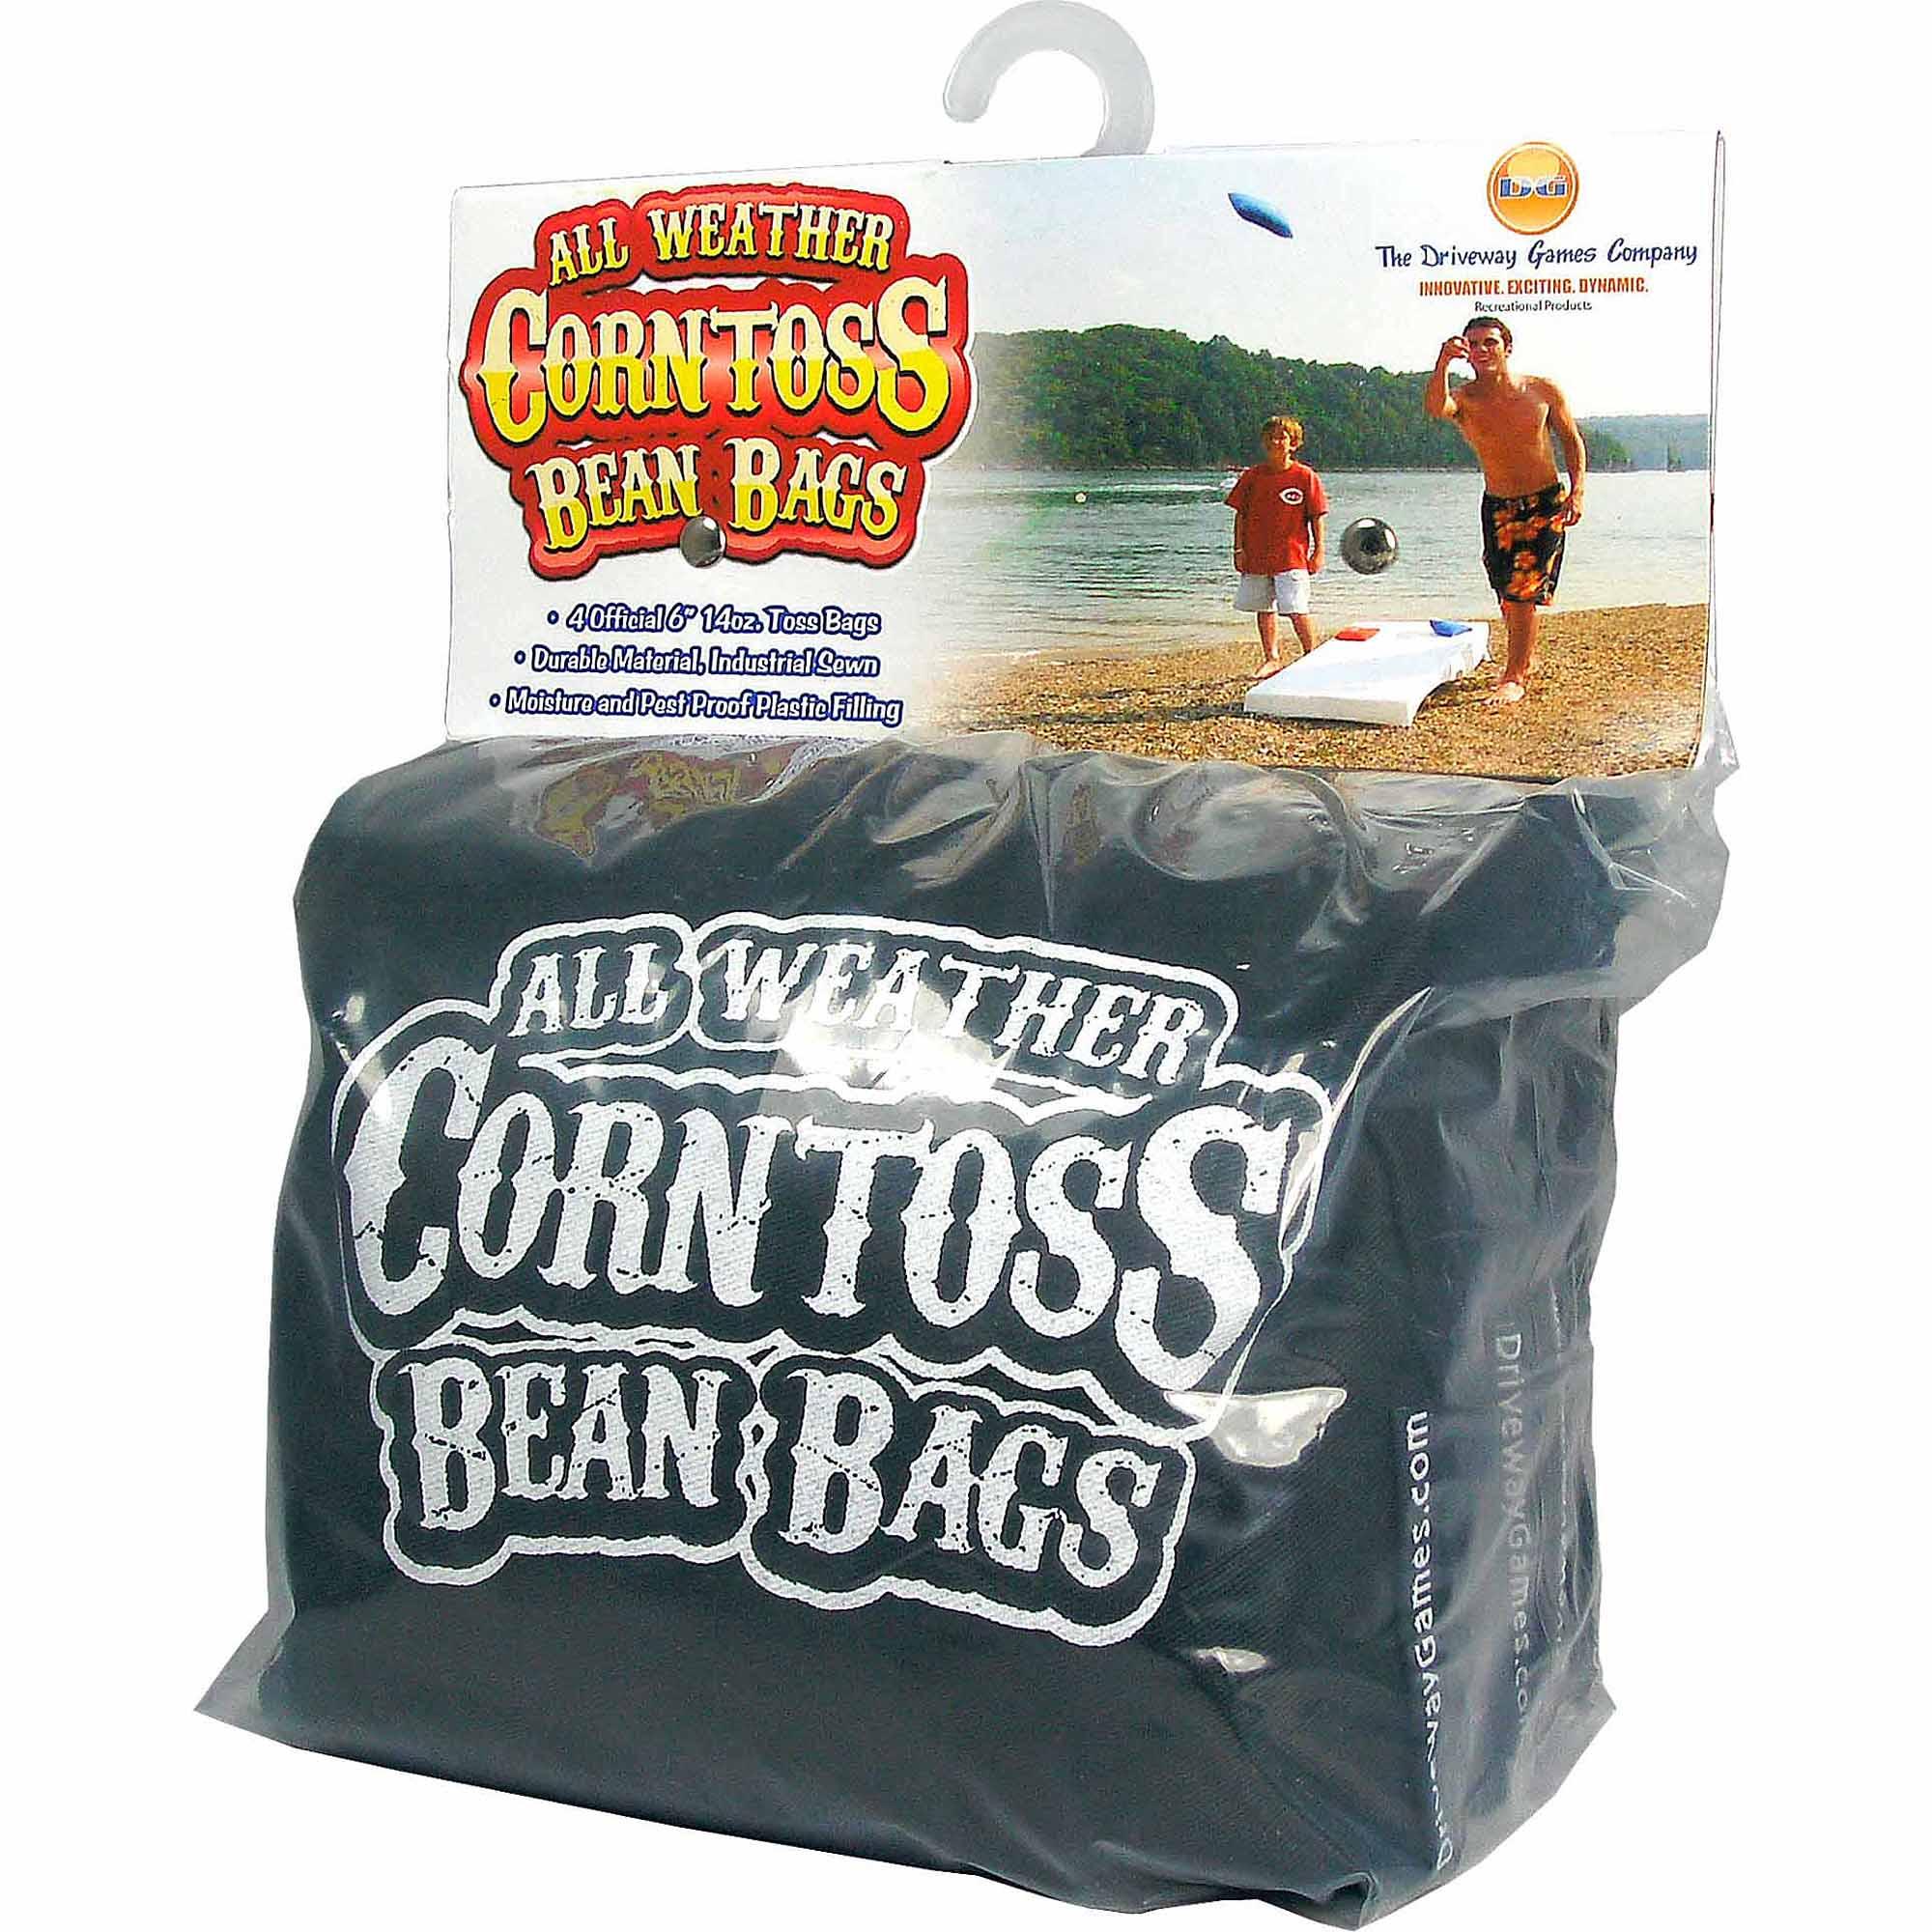 Driveway Games All Weather Corntoss Bean Bags, Black